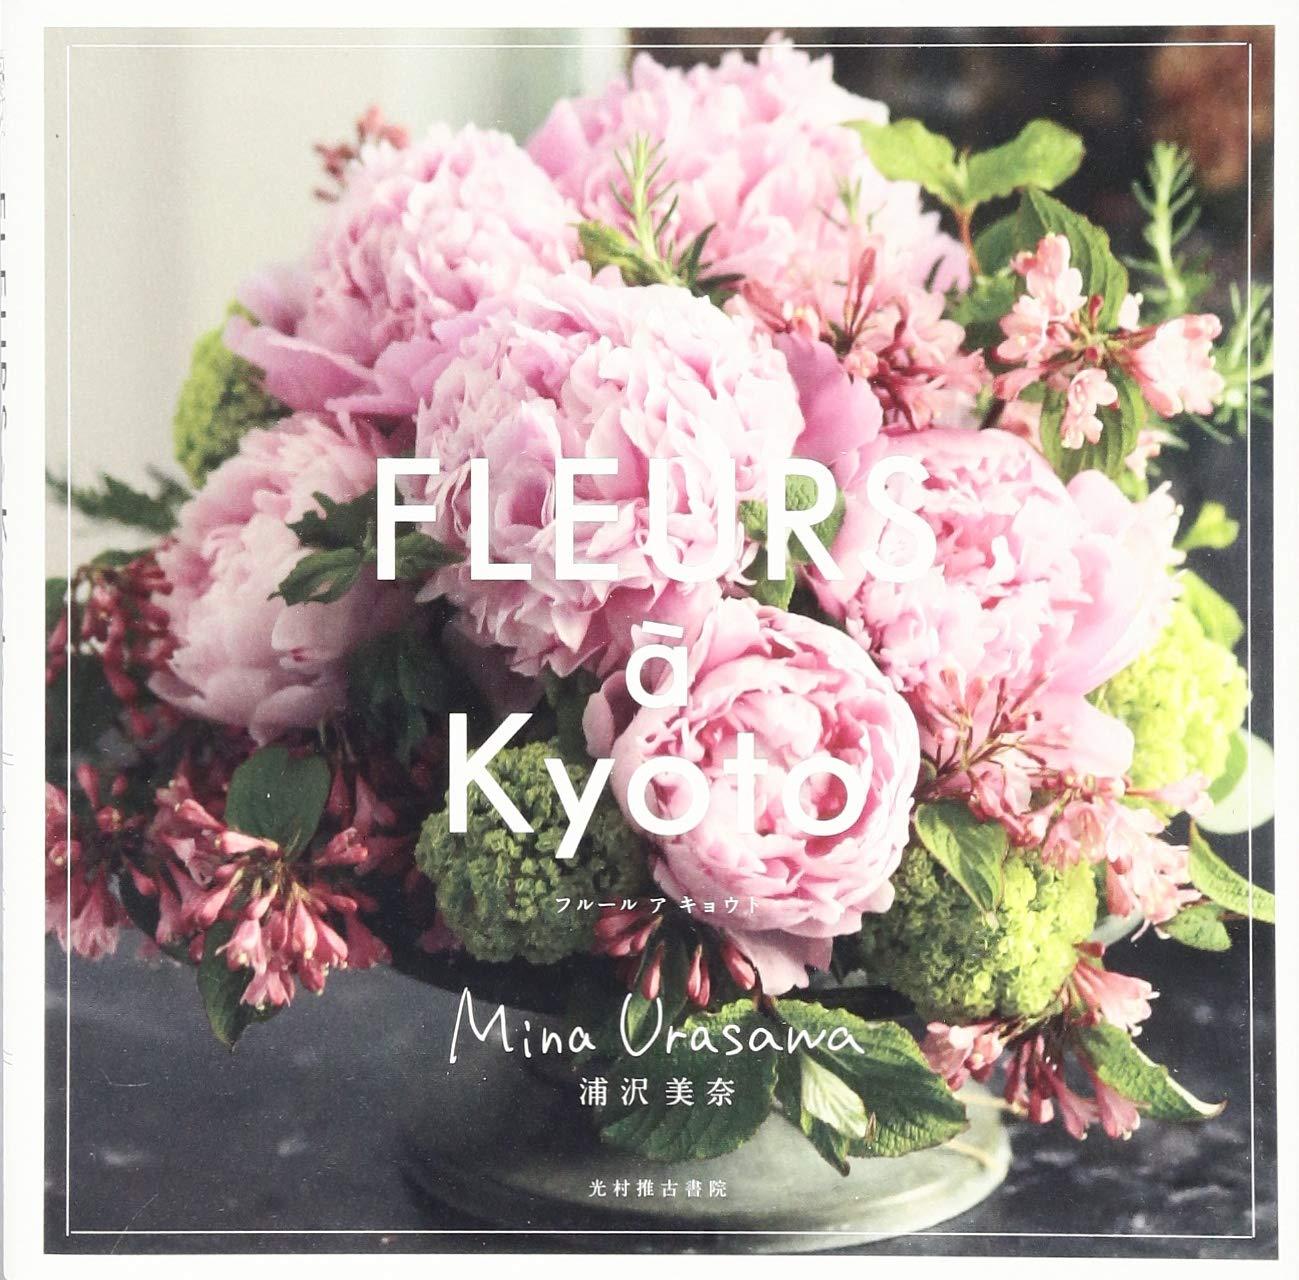 Amazon Com Fleurs A Kyoto 9784838105144 Mina Urasawa Books